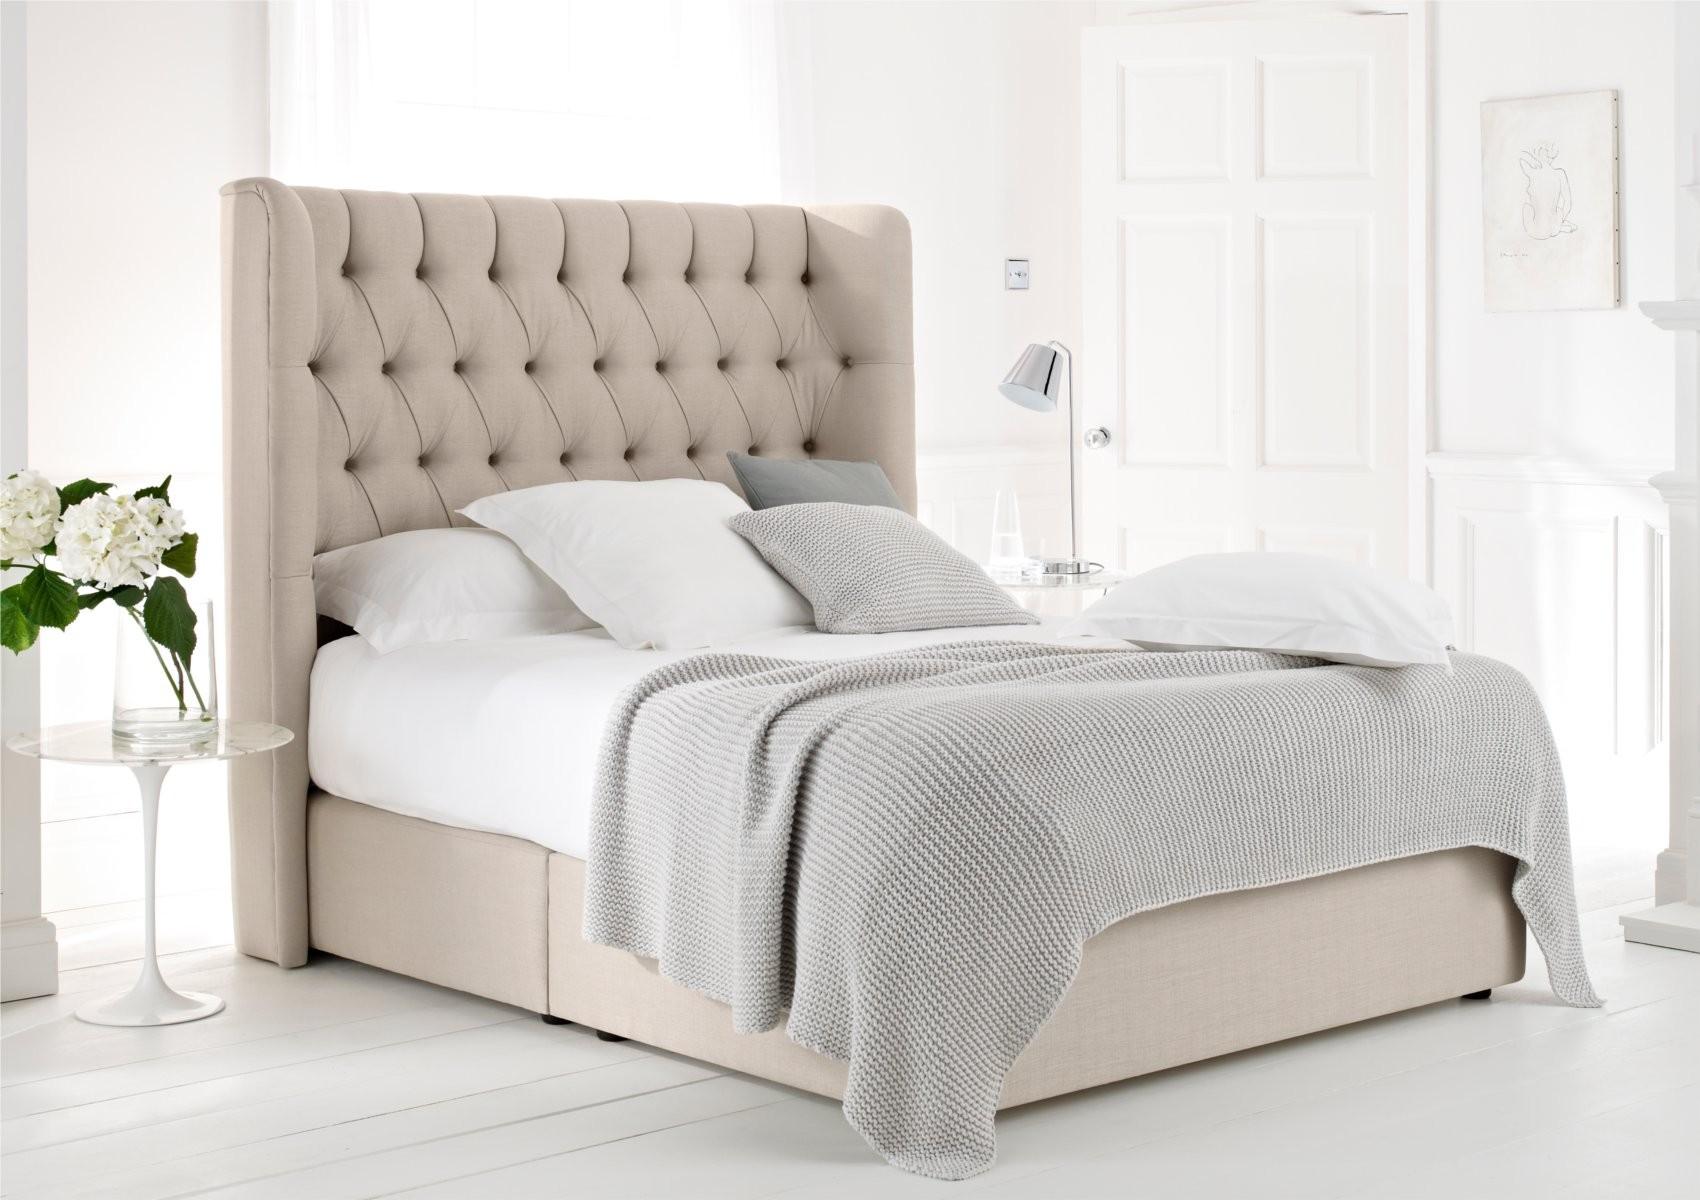 Bespoke Upholstered Bed Frame